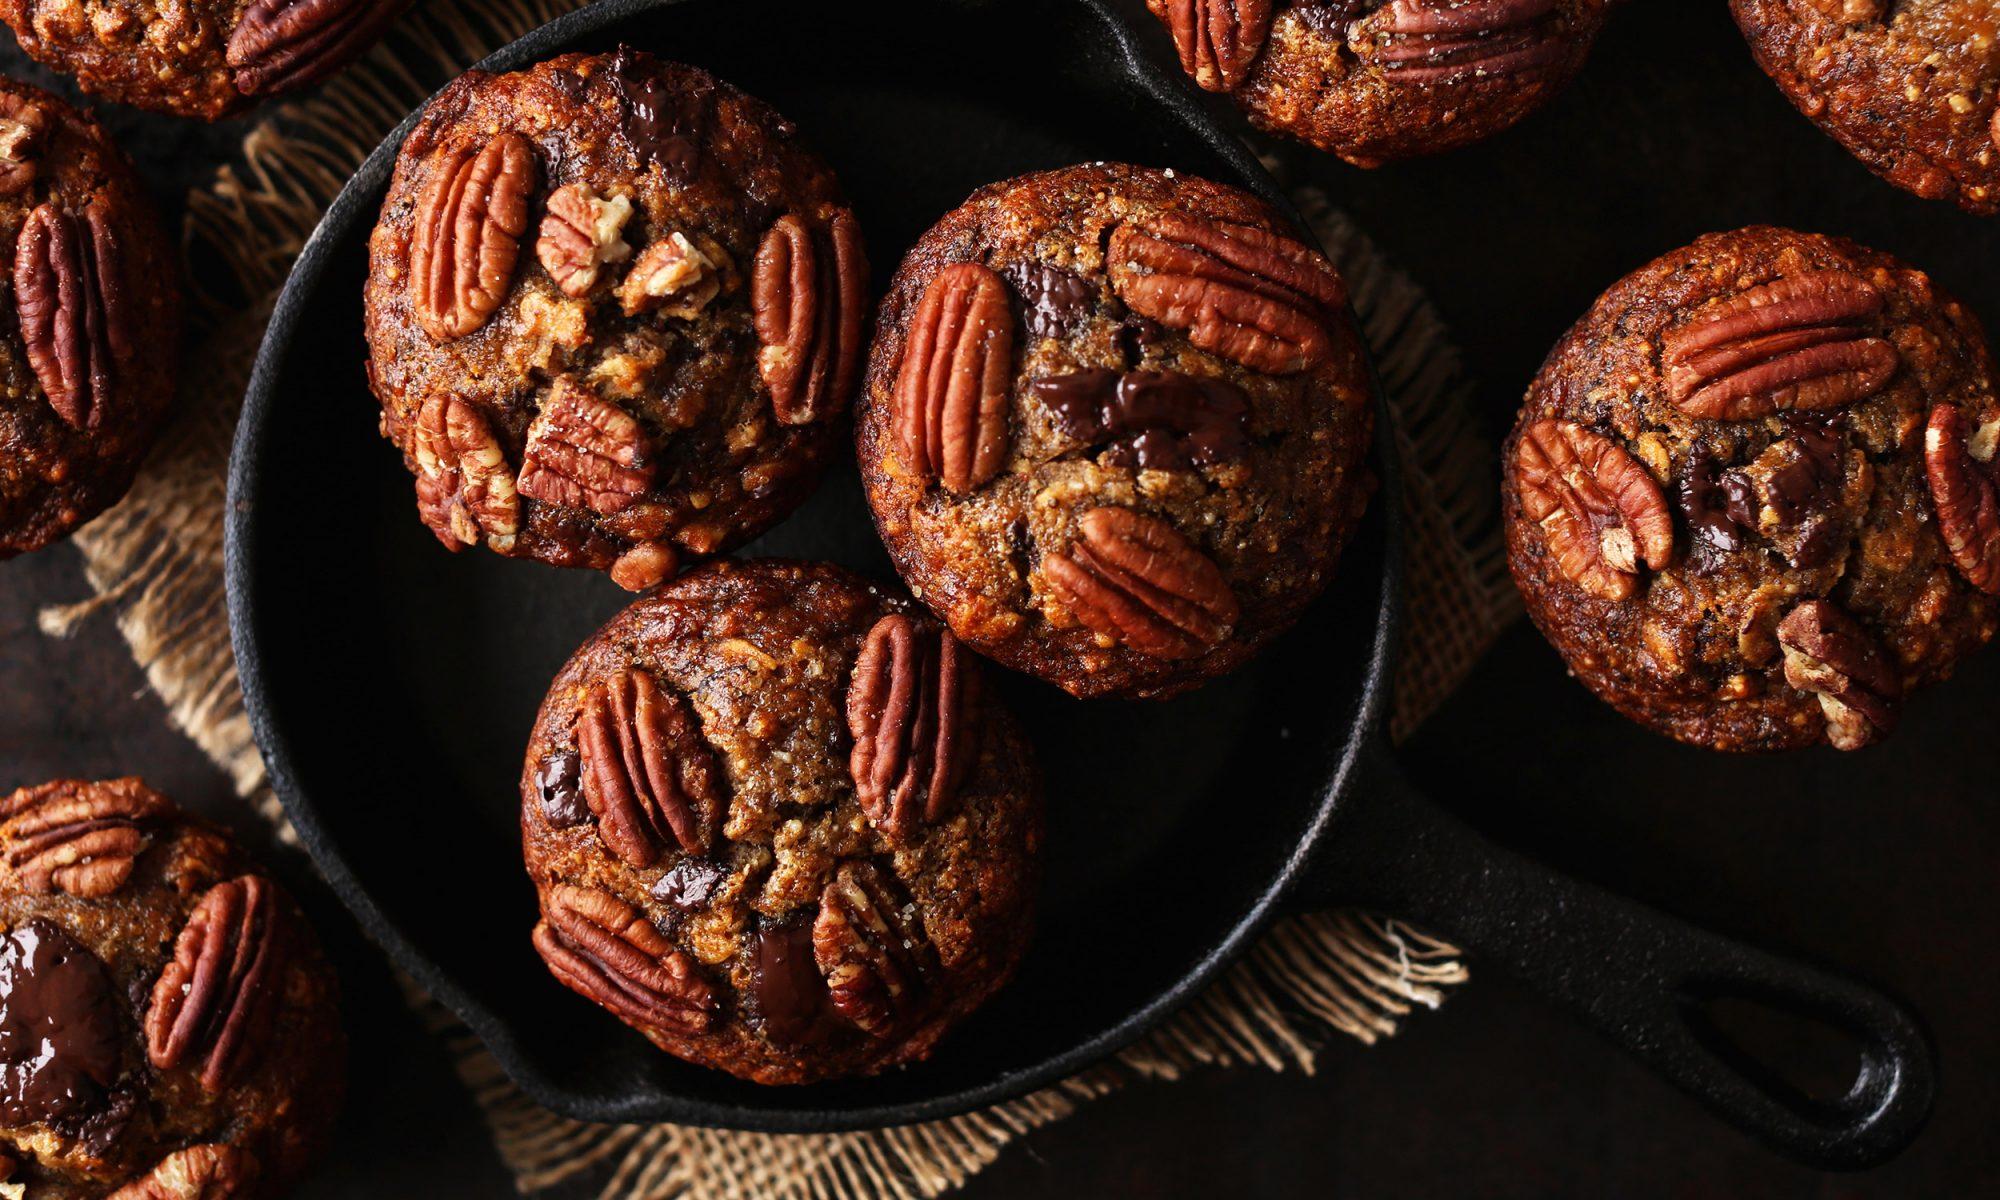 EC: Gluten-Free Vegan Banana Chocolate Pecan Muffins FTW